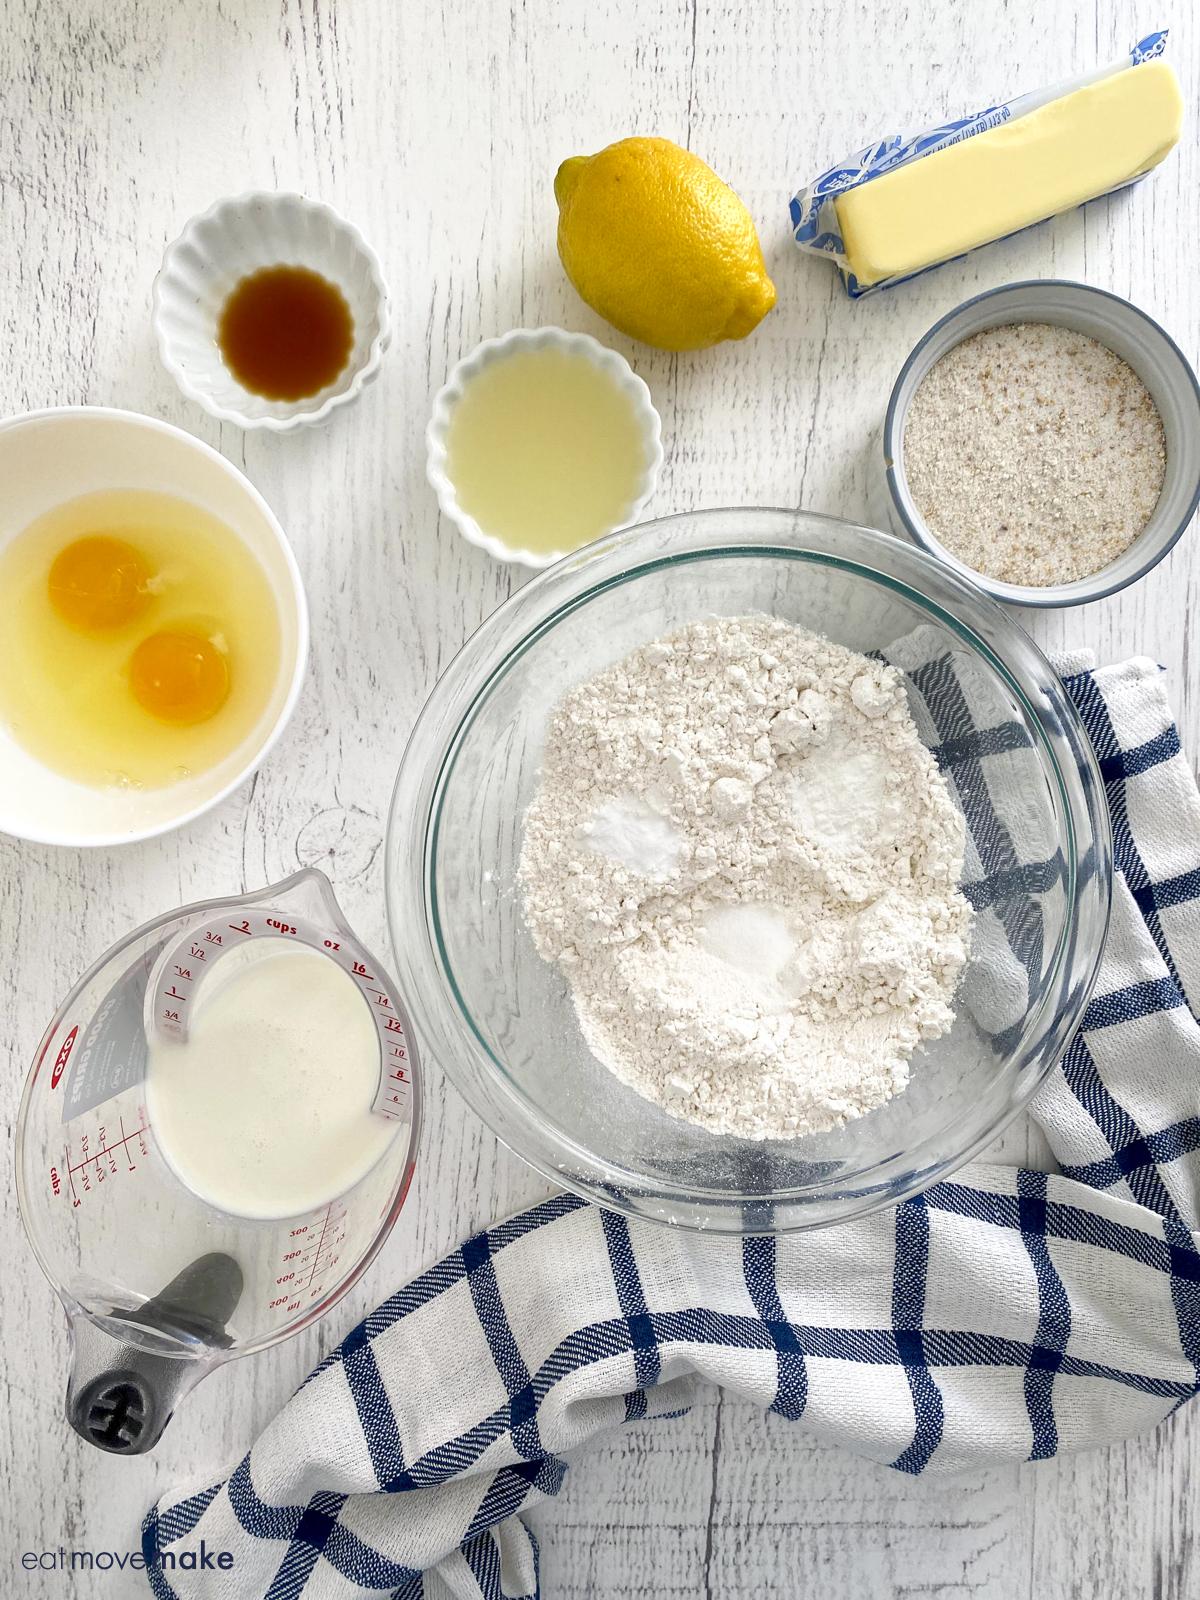 ingredients for lavender lemon bread